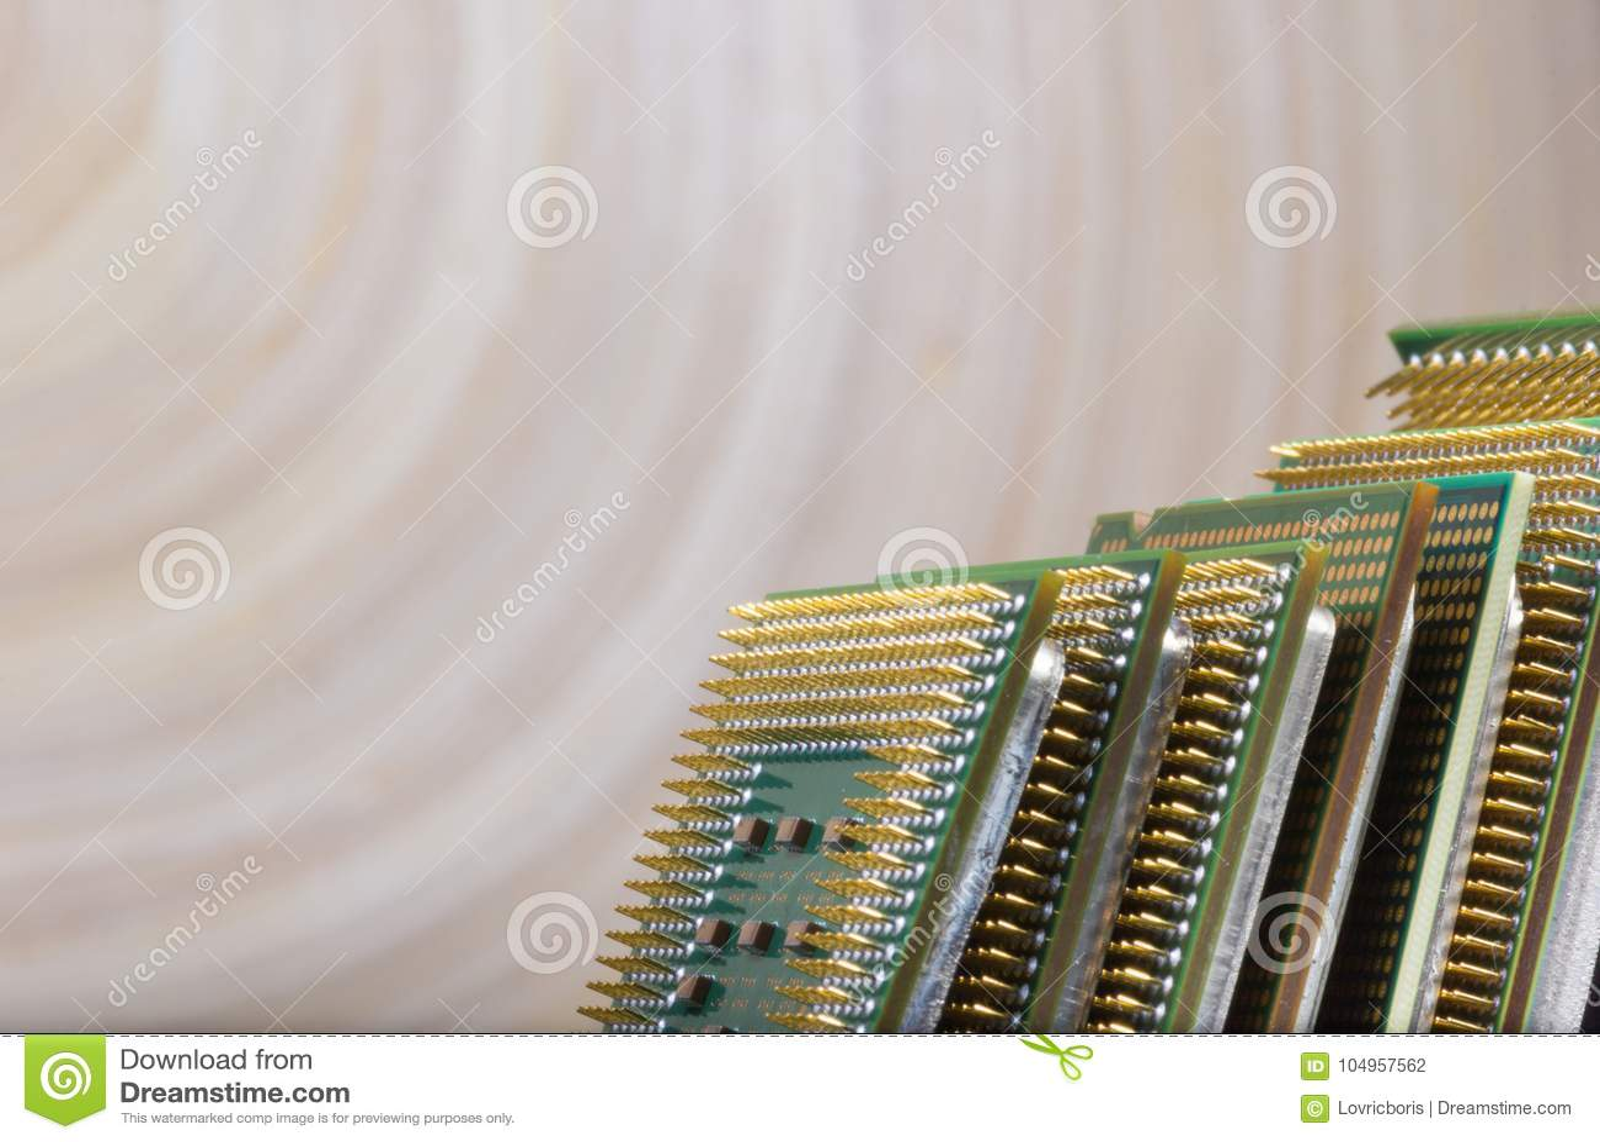 Микропроцессор - деталь крупного плана